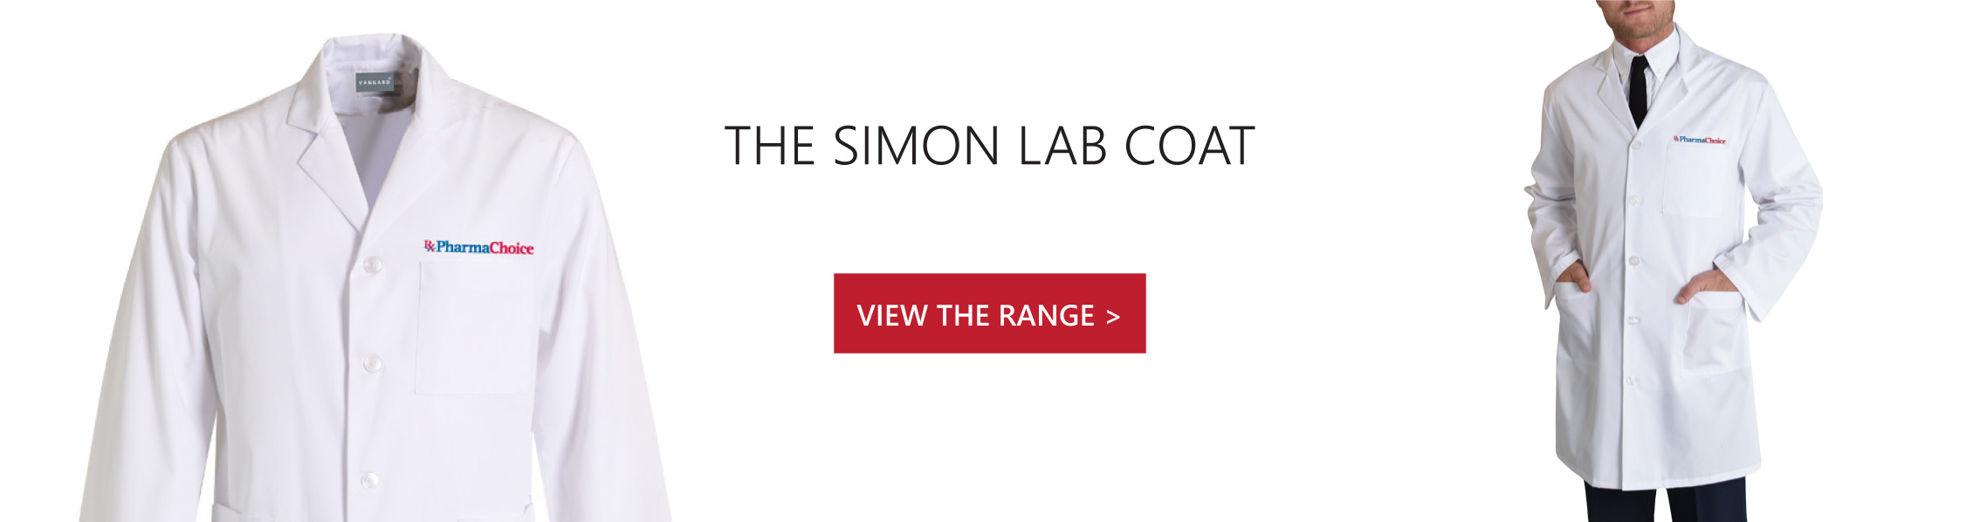 THE SIMON LAB COAT